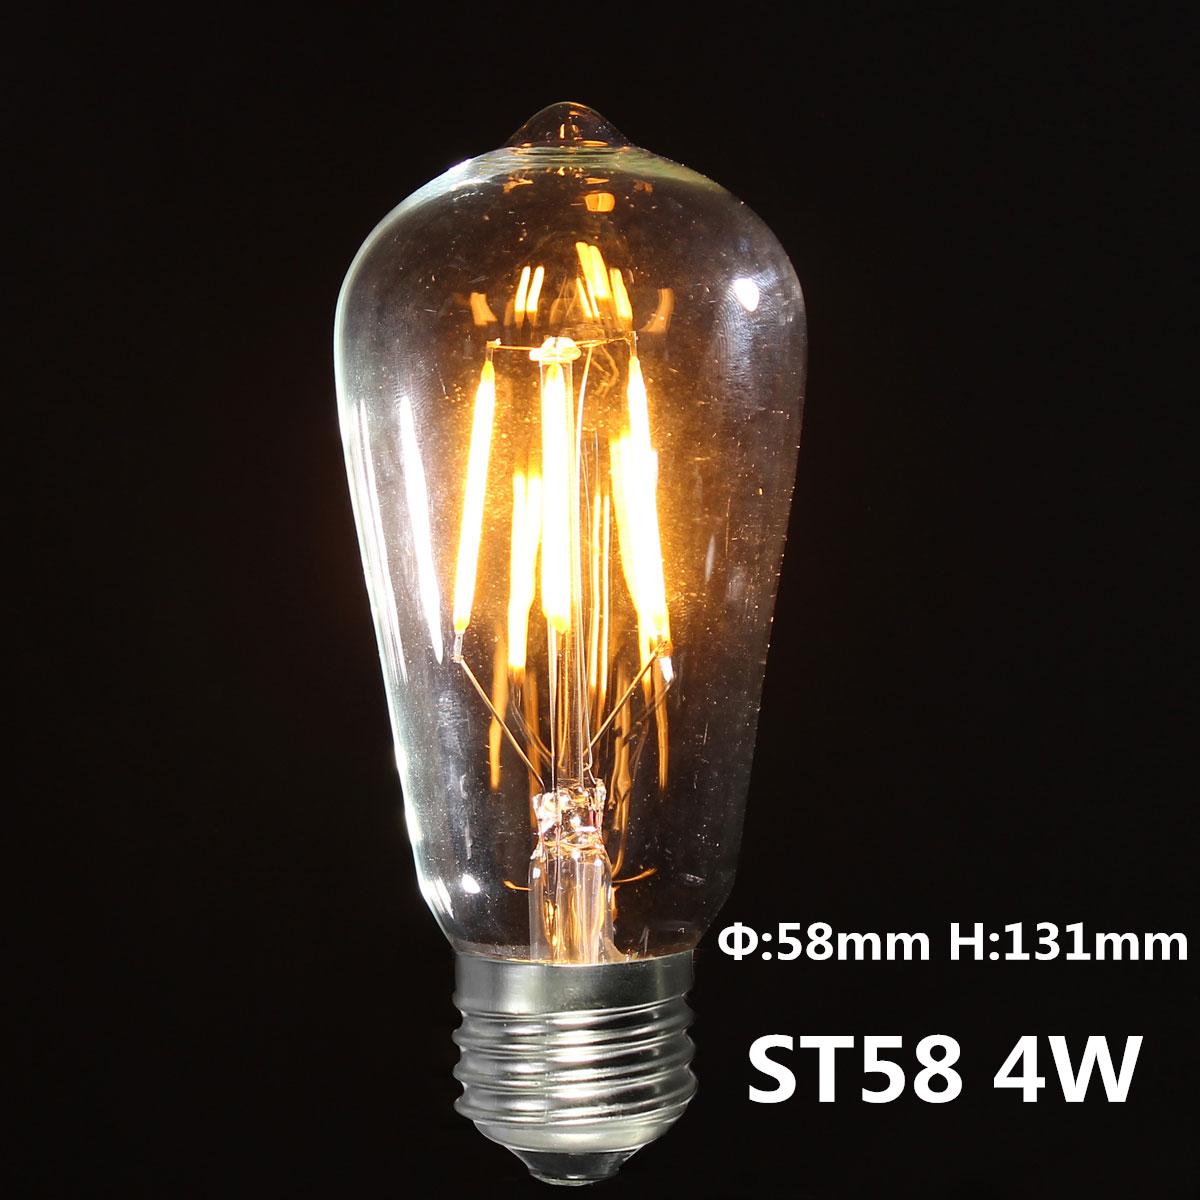 Edison Bulbs 4 Tier Led Vintage Light Bulb: 2/3/4W E27 ES COB LED Vintage Antique Edison Style Light